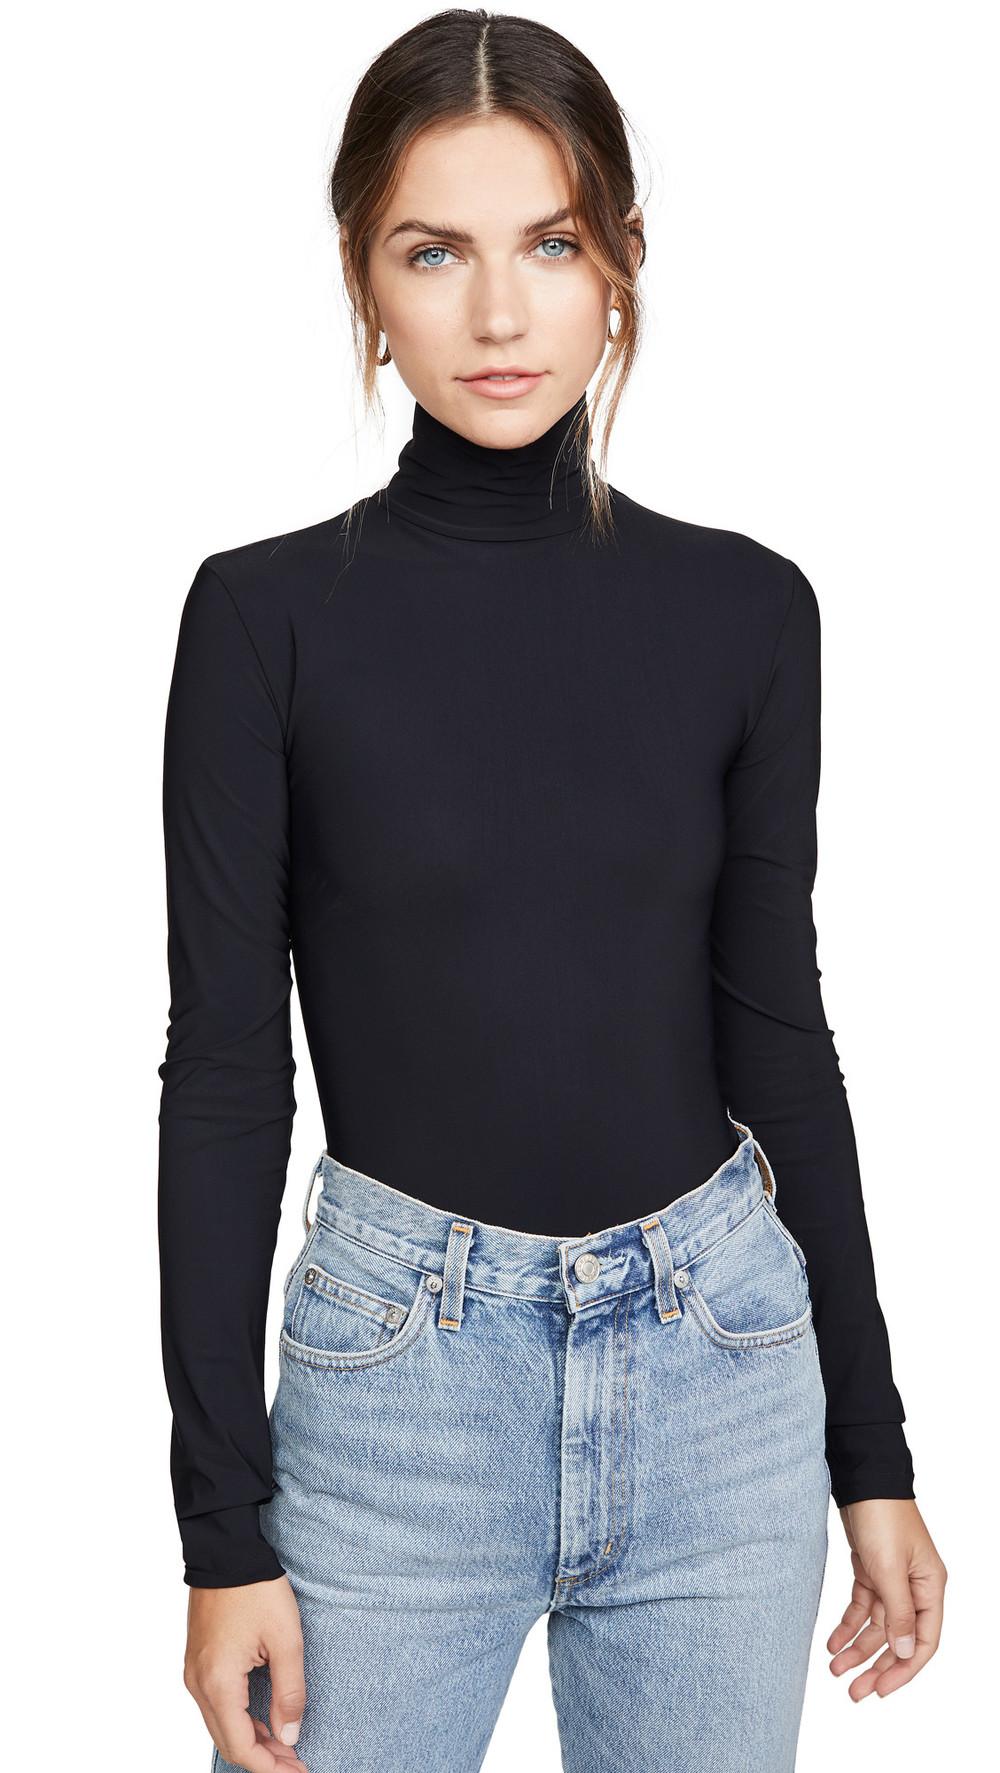 Alix Warren Thong Back Bodysuit in black